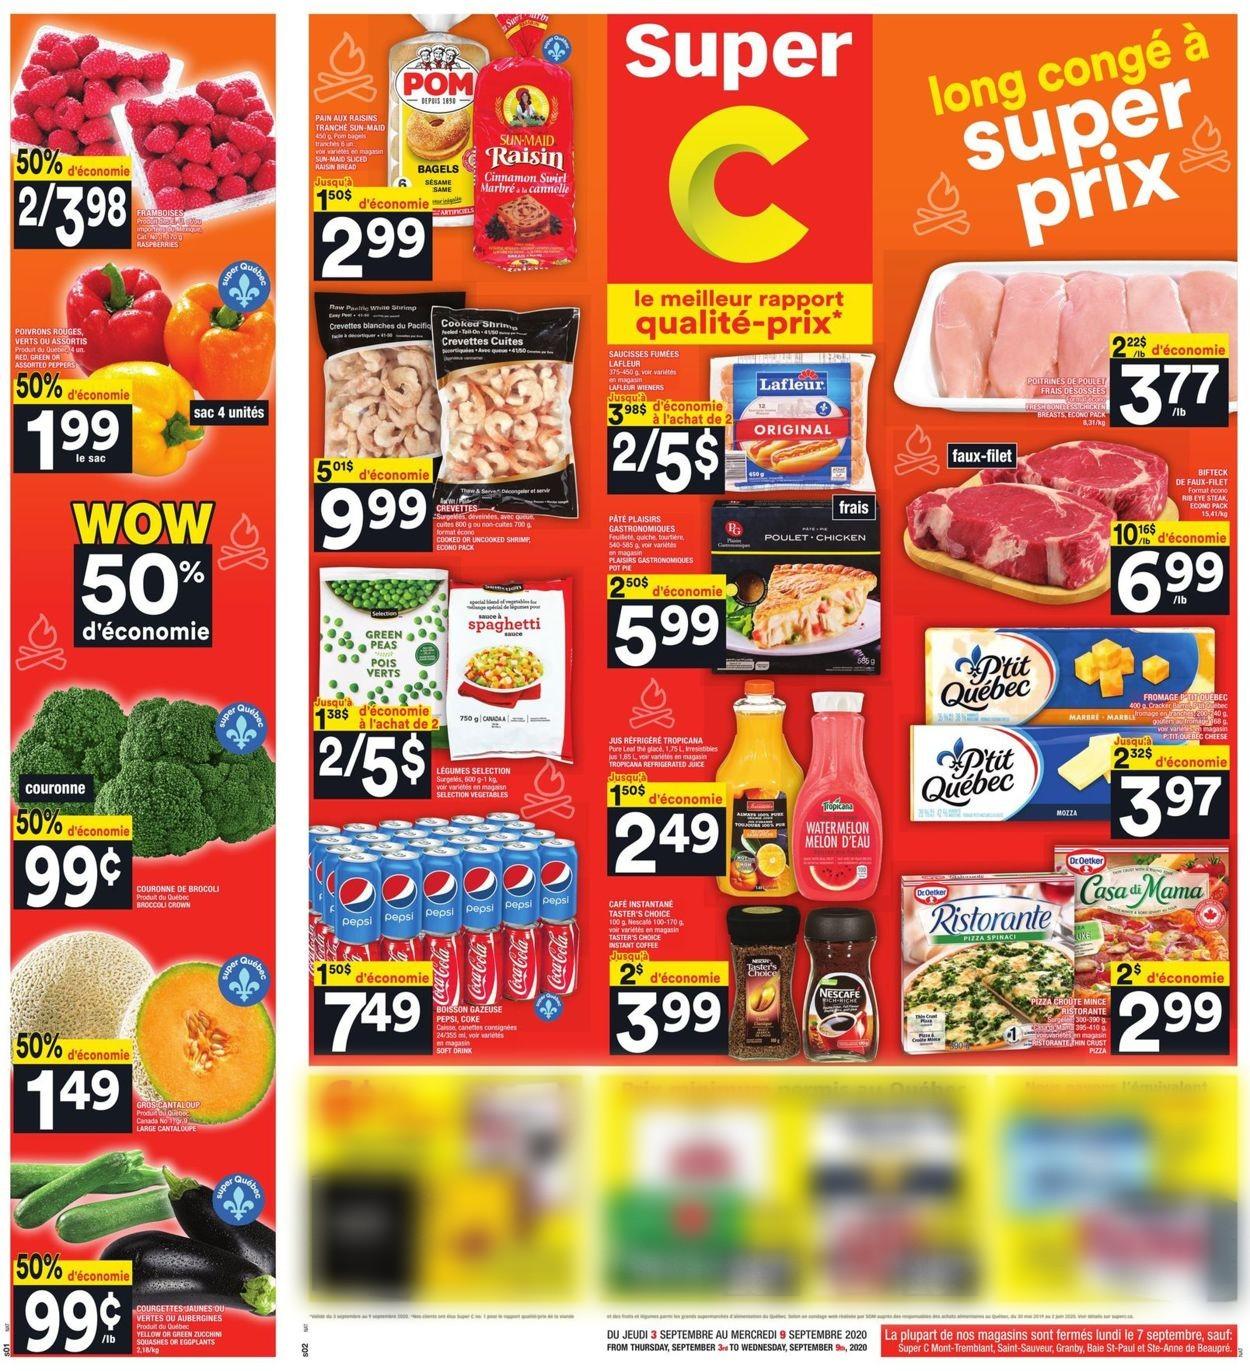 Super C Flyer - 09/03-09/09/2020